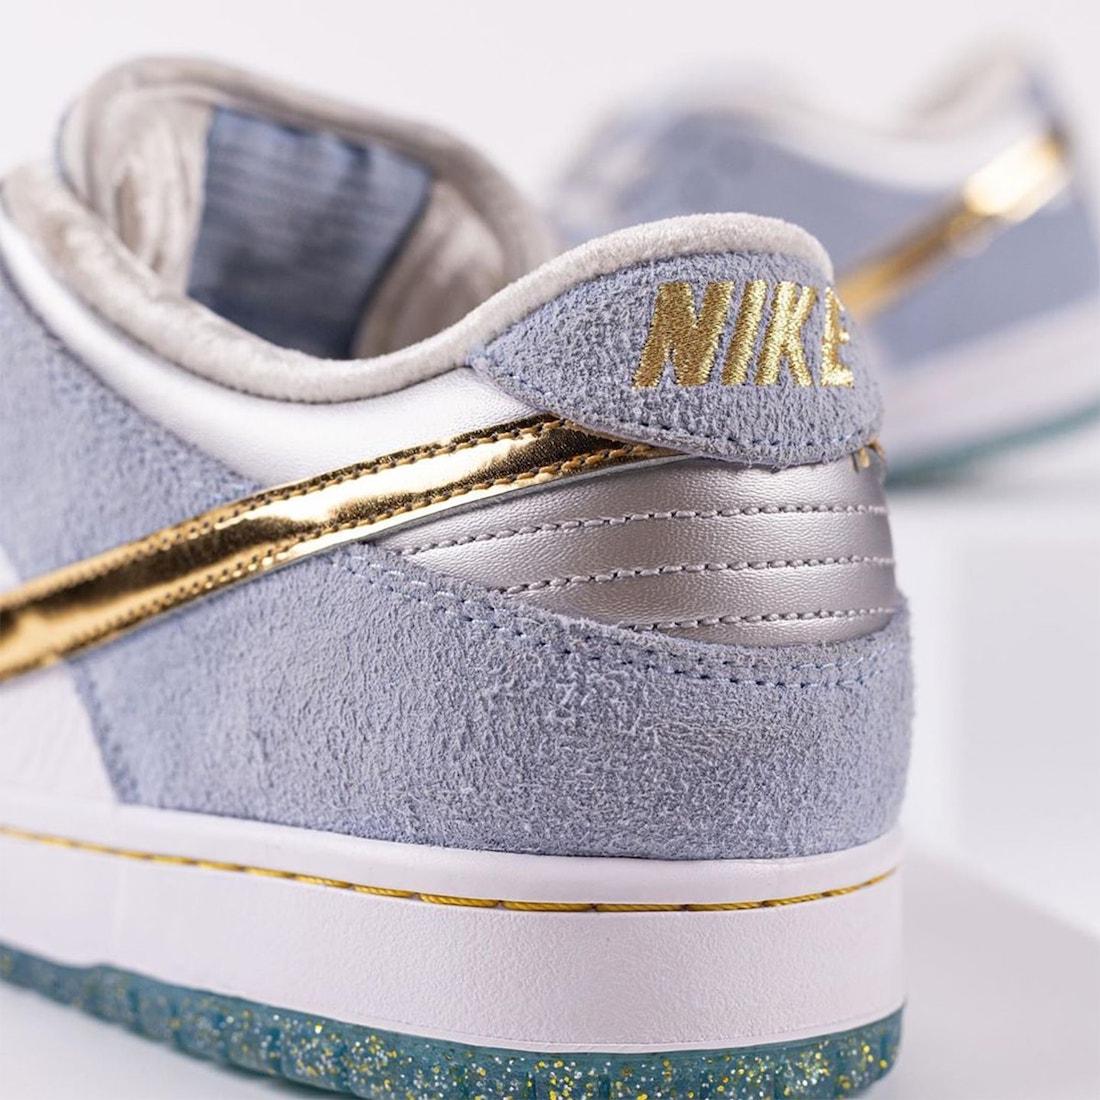 Sean-Cliver-Nike-SB-Dunk-Low-DC9936-100-pair-heel-left